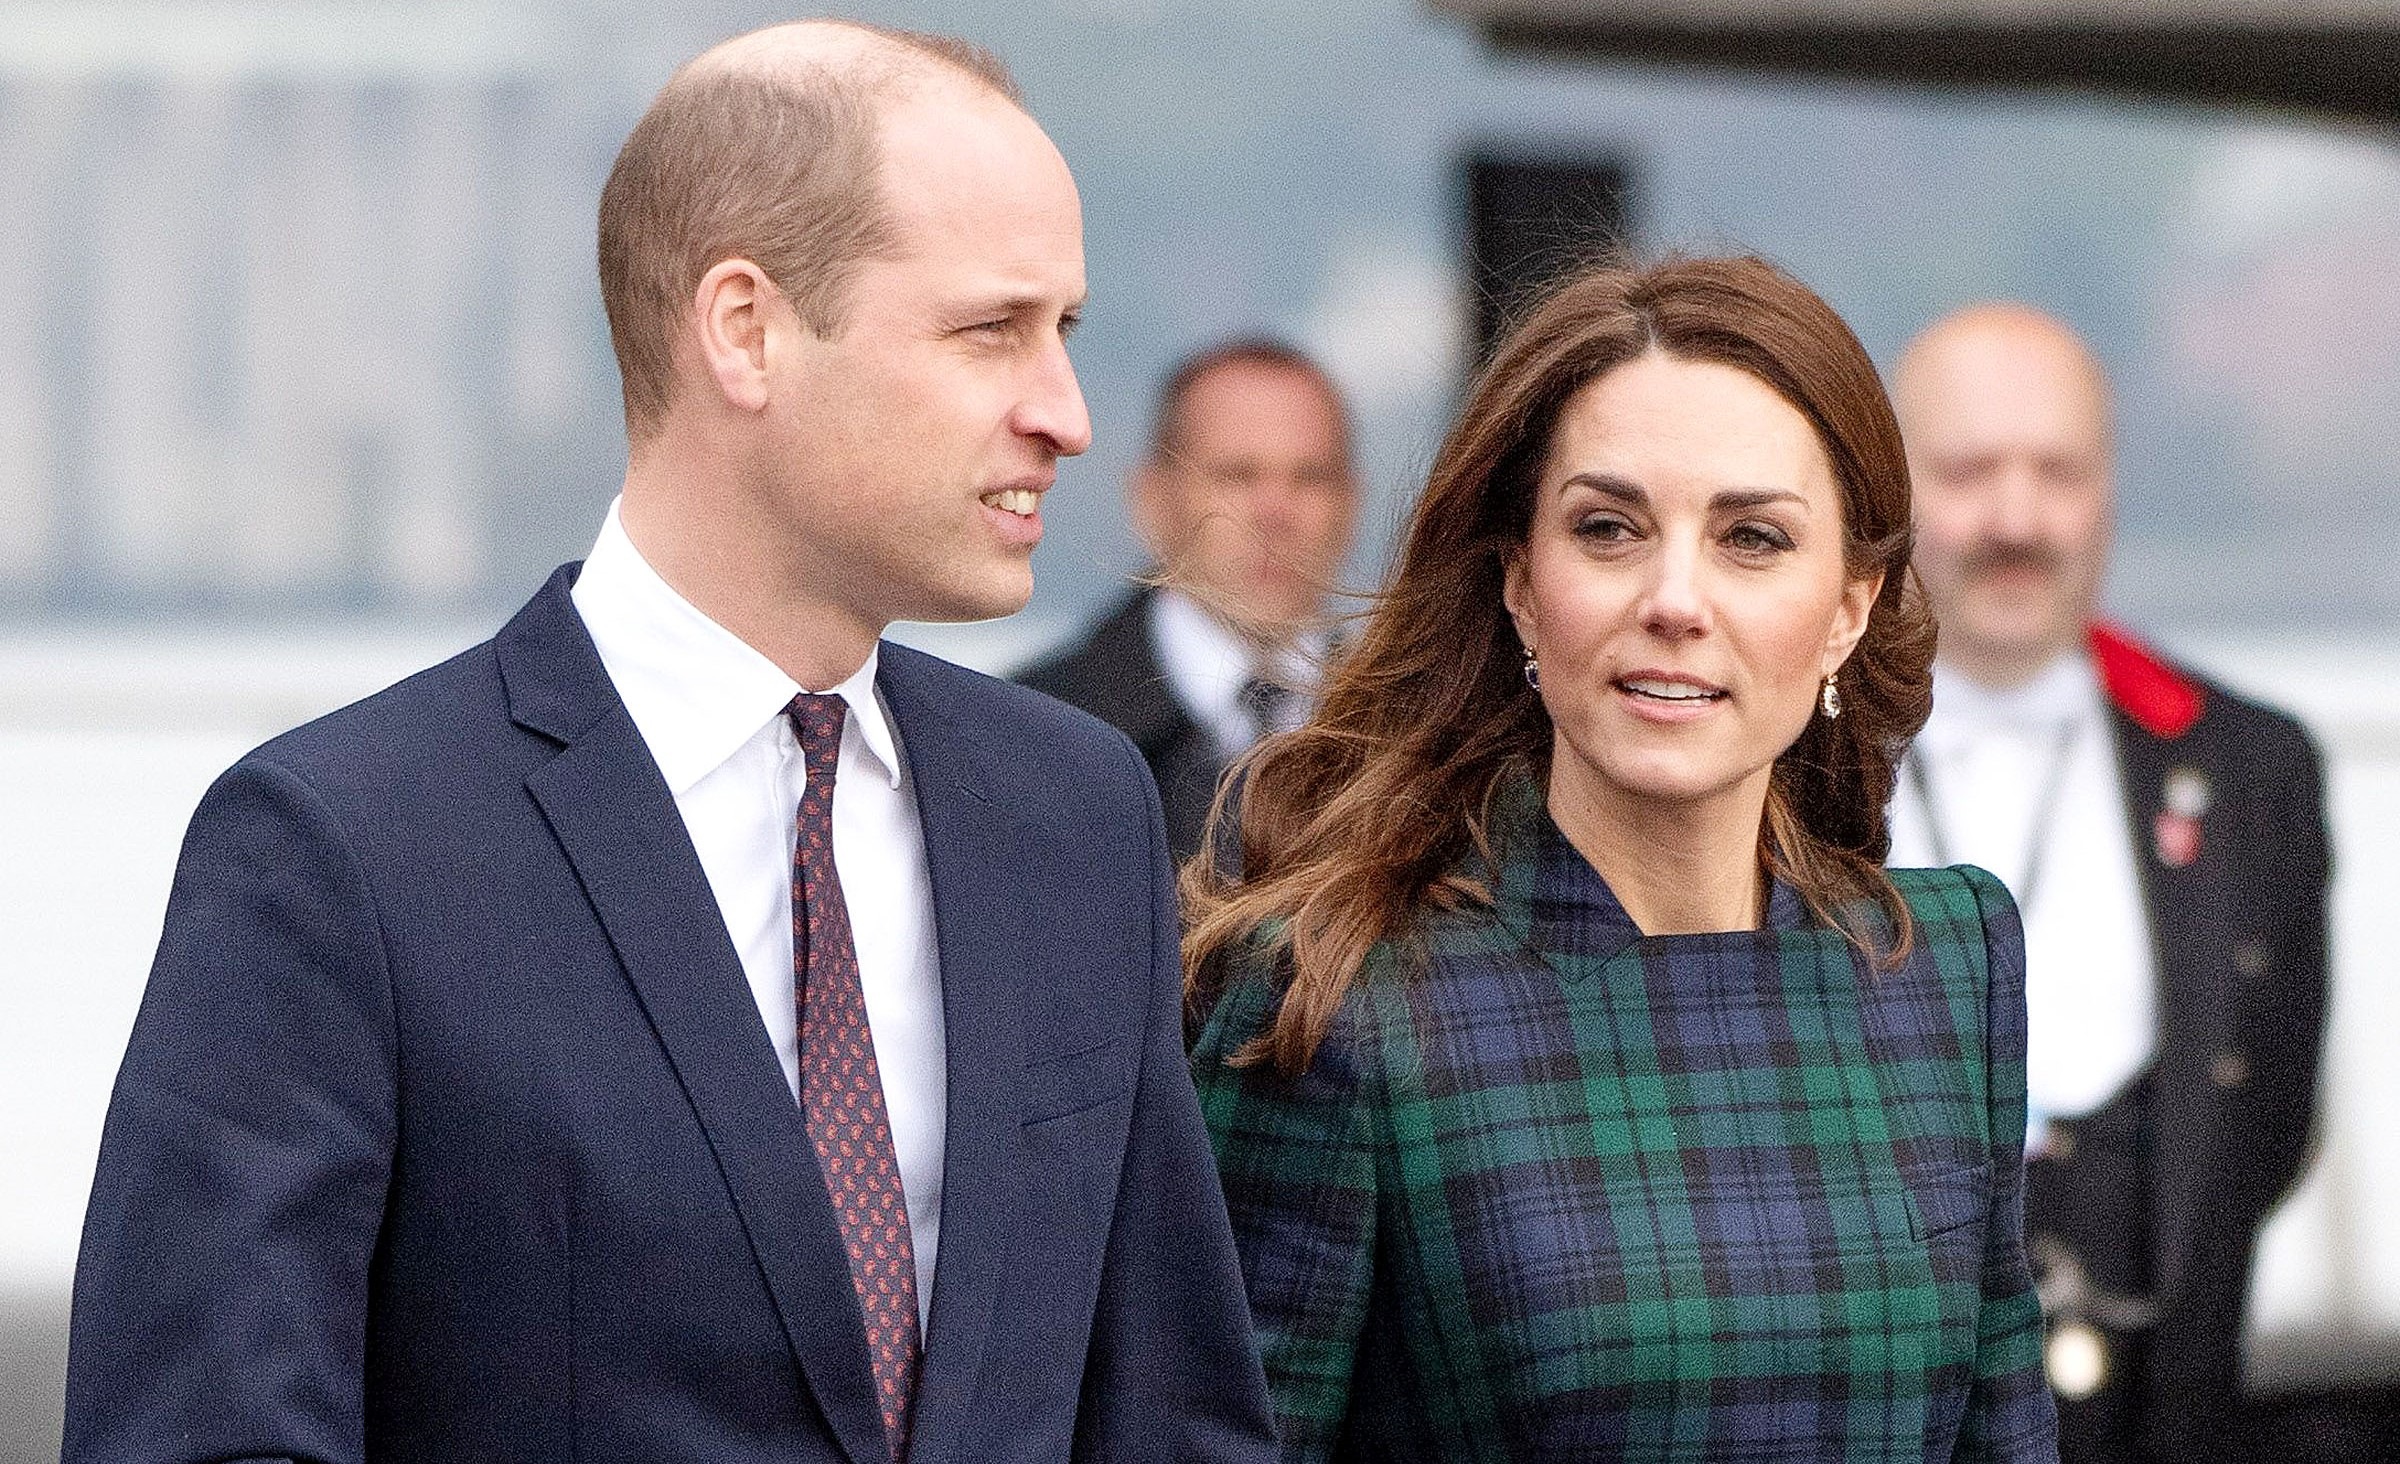 The Duke and Duchess of Cambridge have met baby nephew Archie